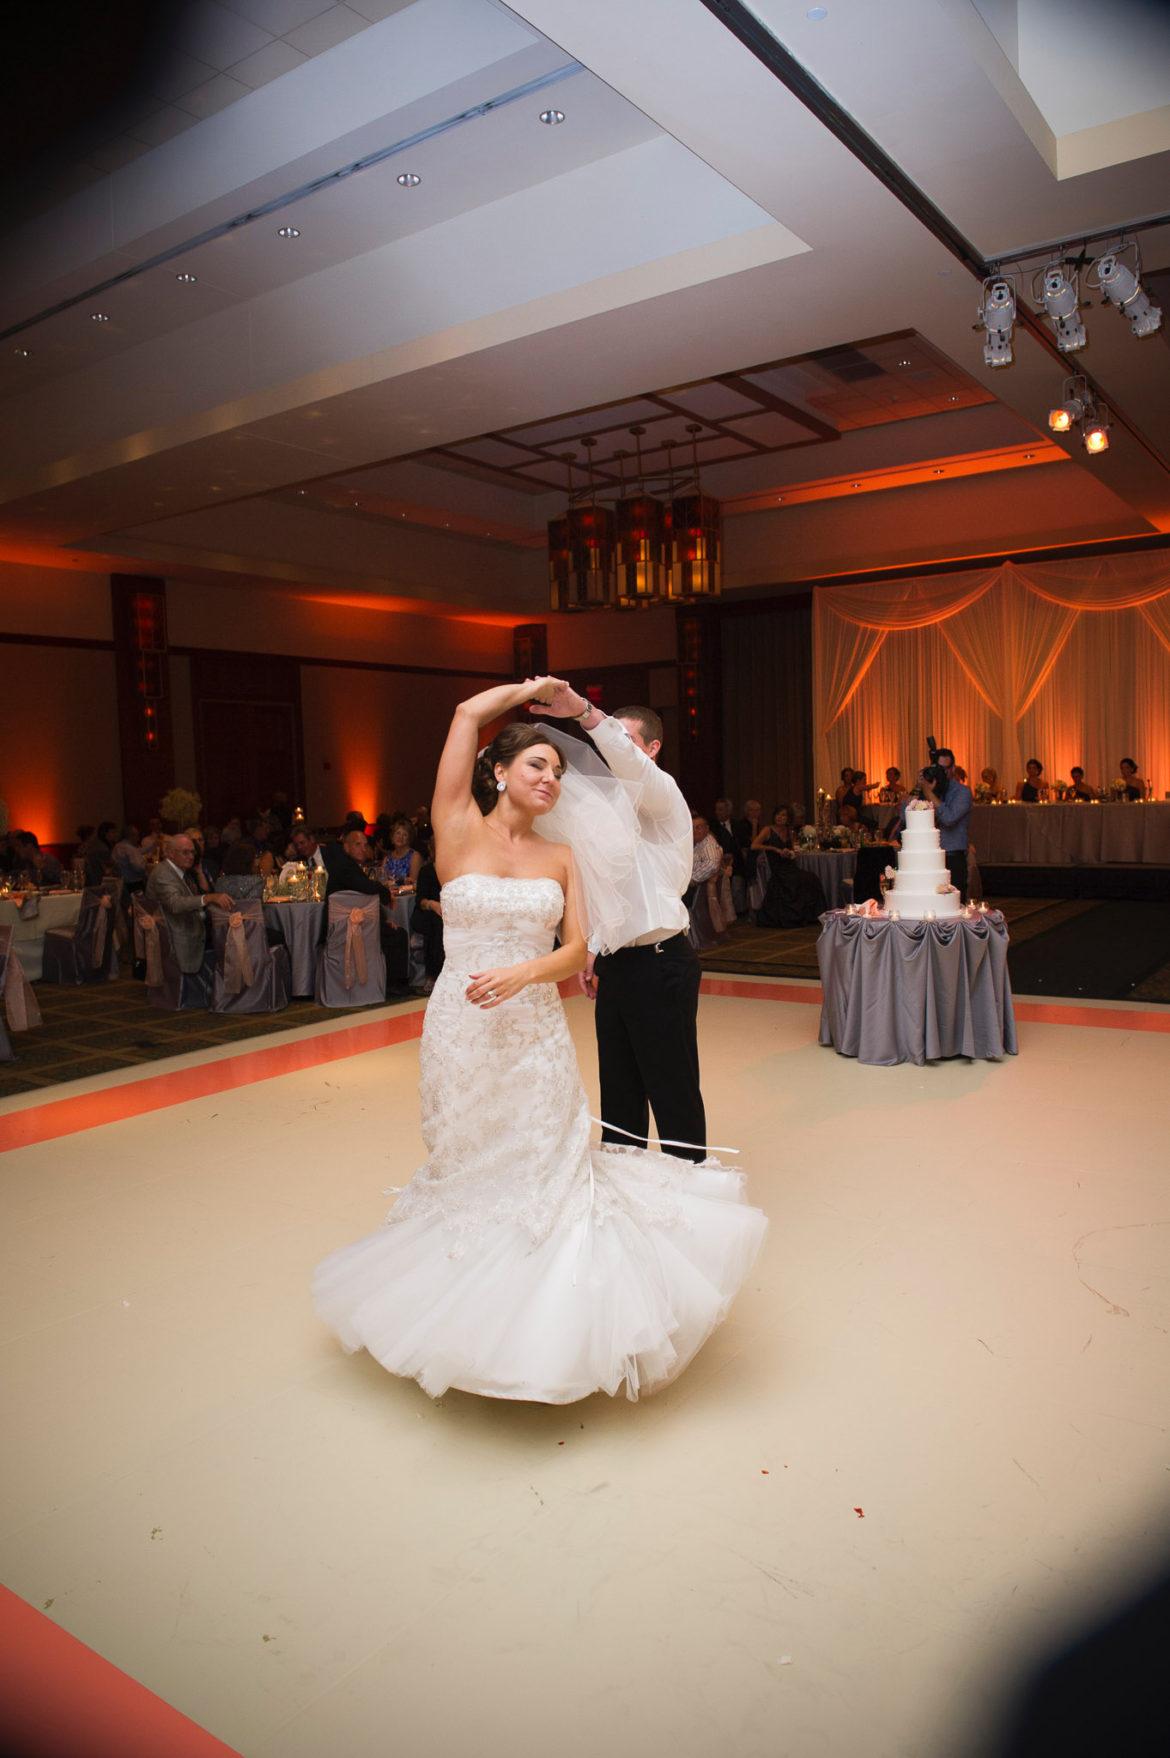 Elegant_Event_Lighting_Chicago_Eaglewood_Resort_Spa_Itasca_Wedding_Ivory_Matte_Dance_Floor_First_Dance_Amber_LED_Uplighting